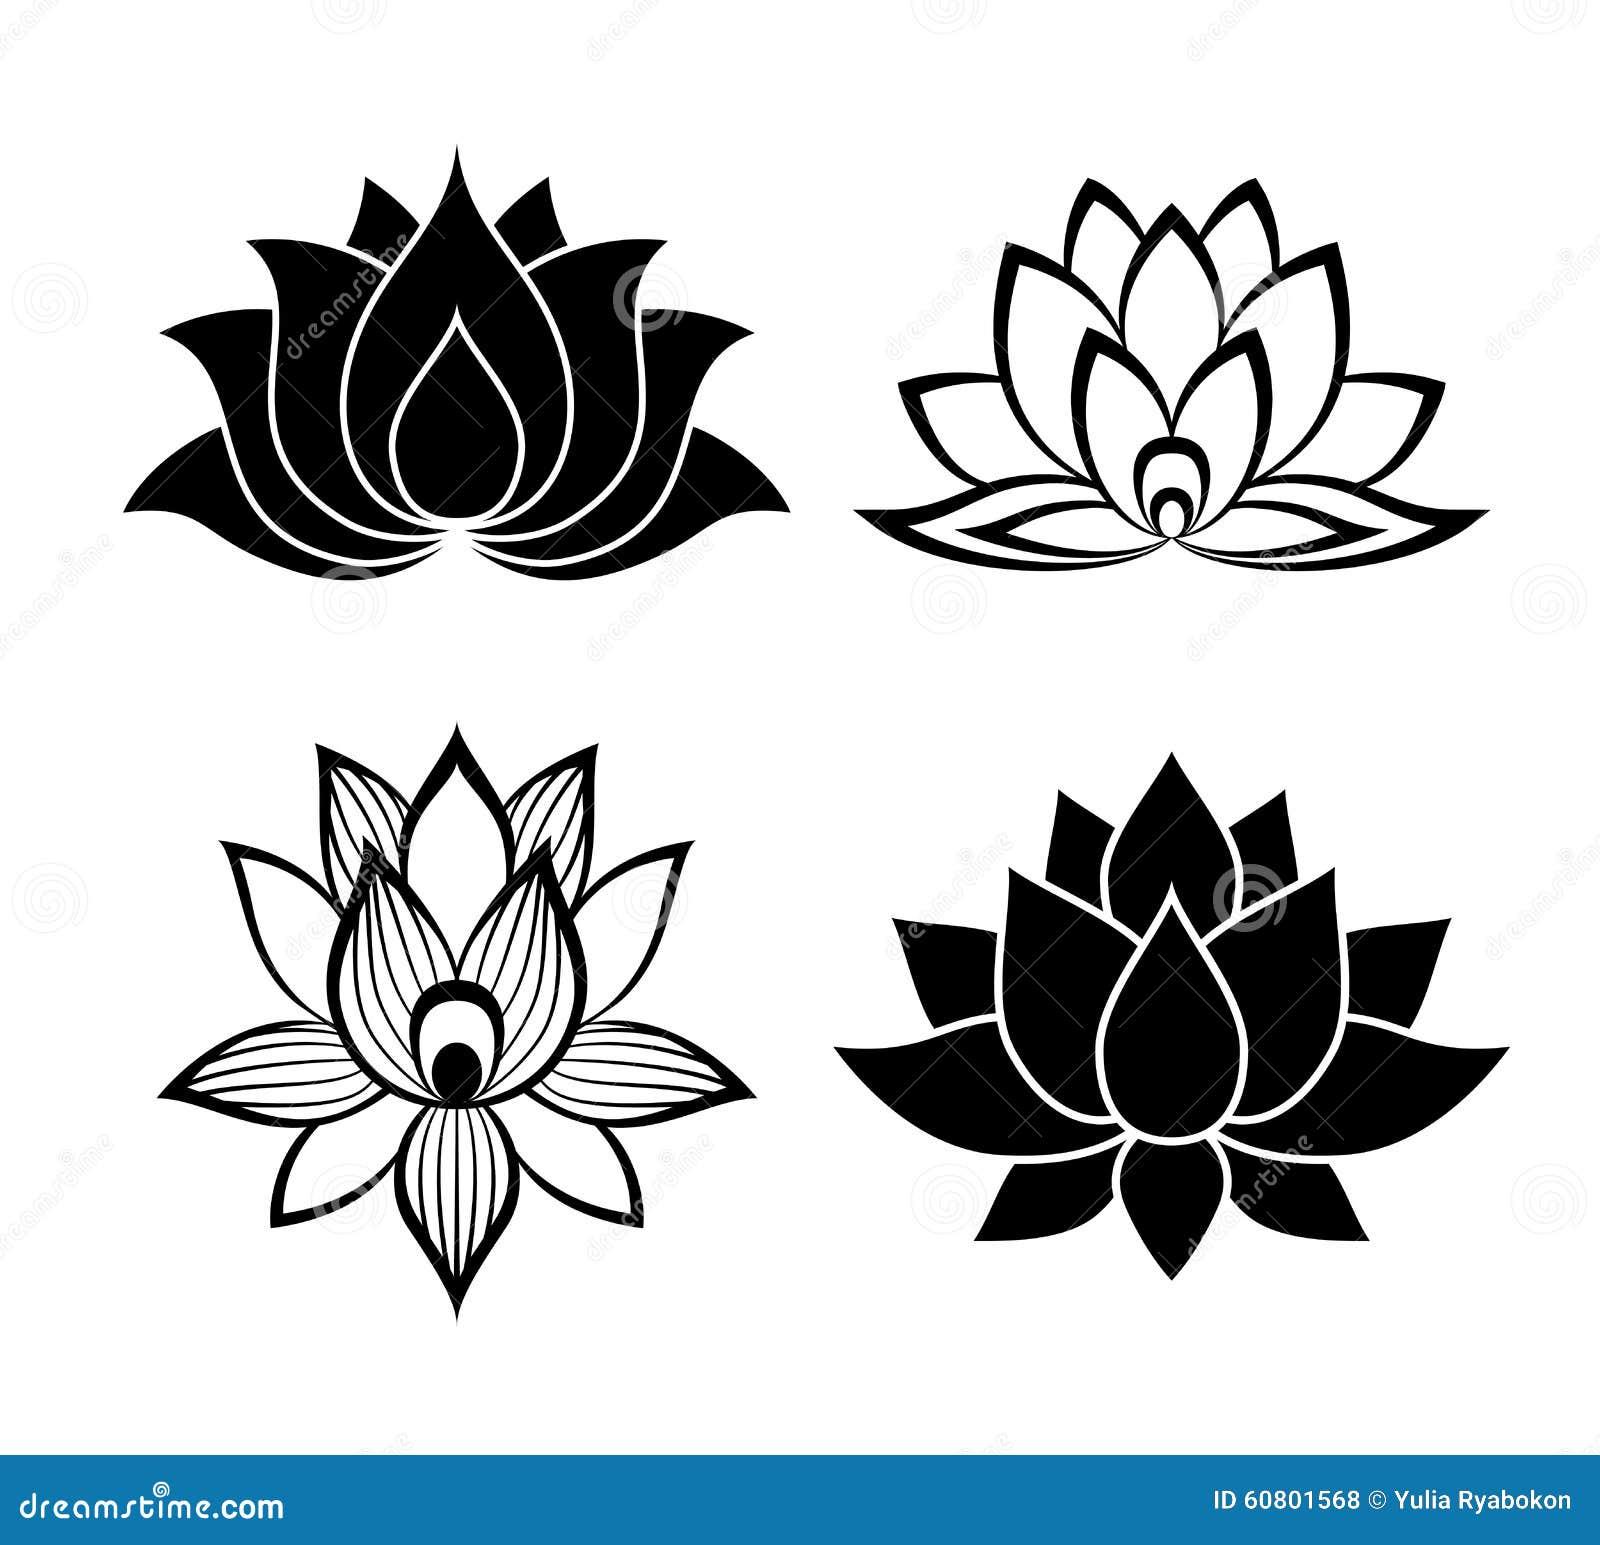 Stylized lotus flower icon vector background stock vector lotus flower signs set stock illustration izmirmasajfo